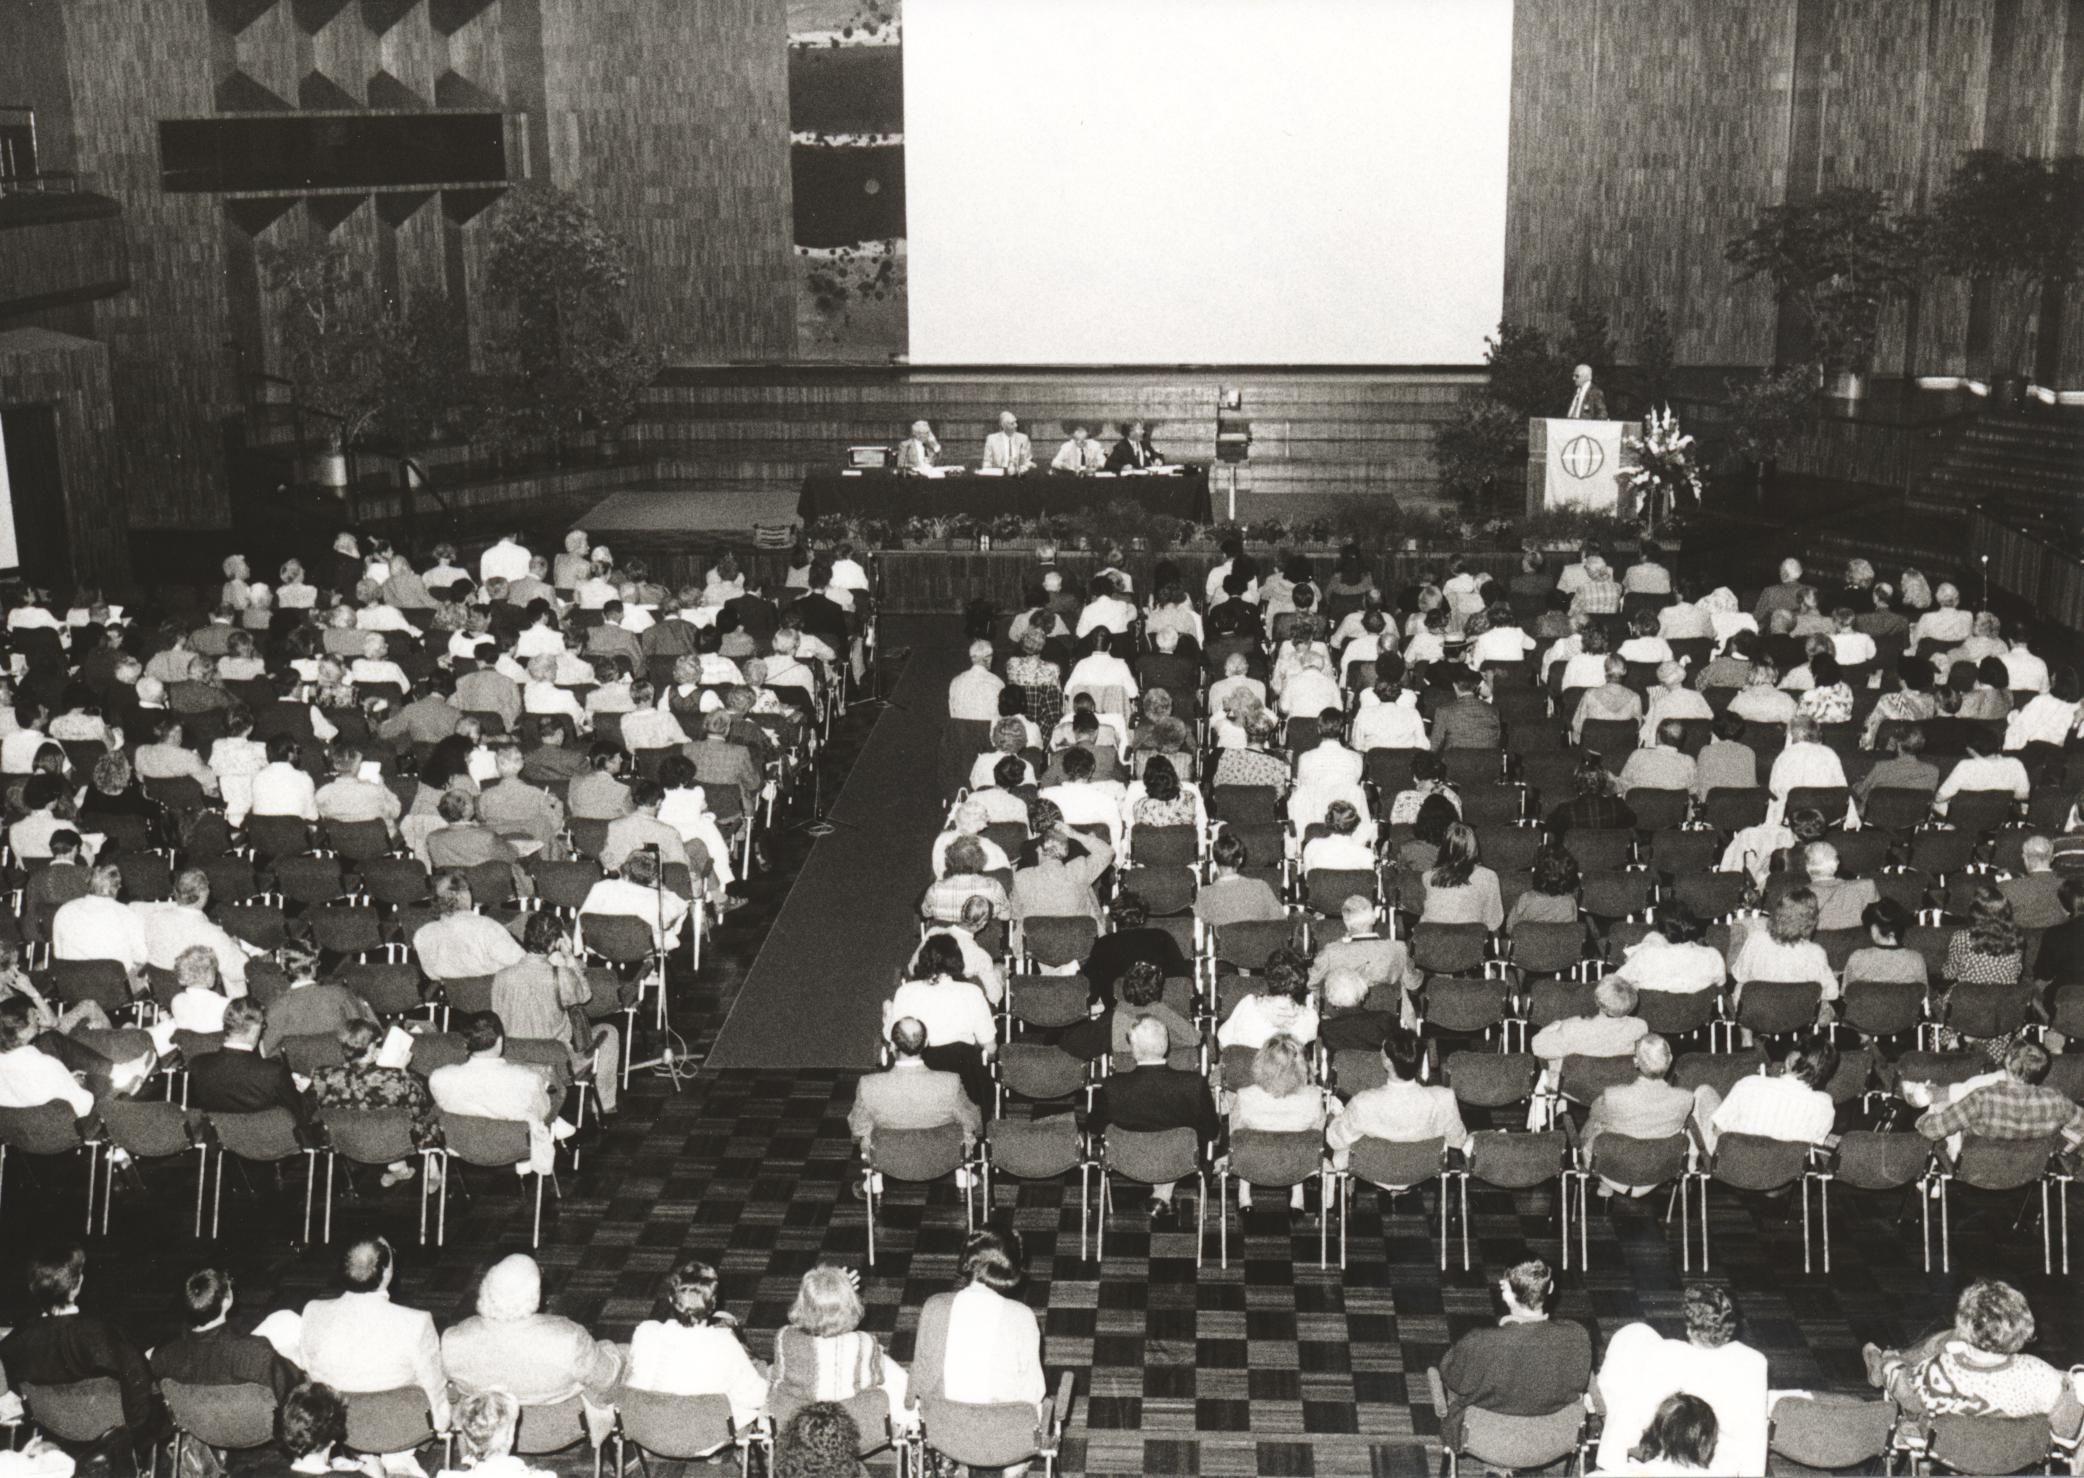 XII. Imago Mundi-Kongress 1989, Innsbruck, Teilnehmerfoto